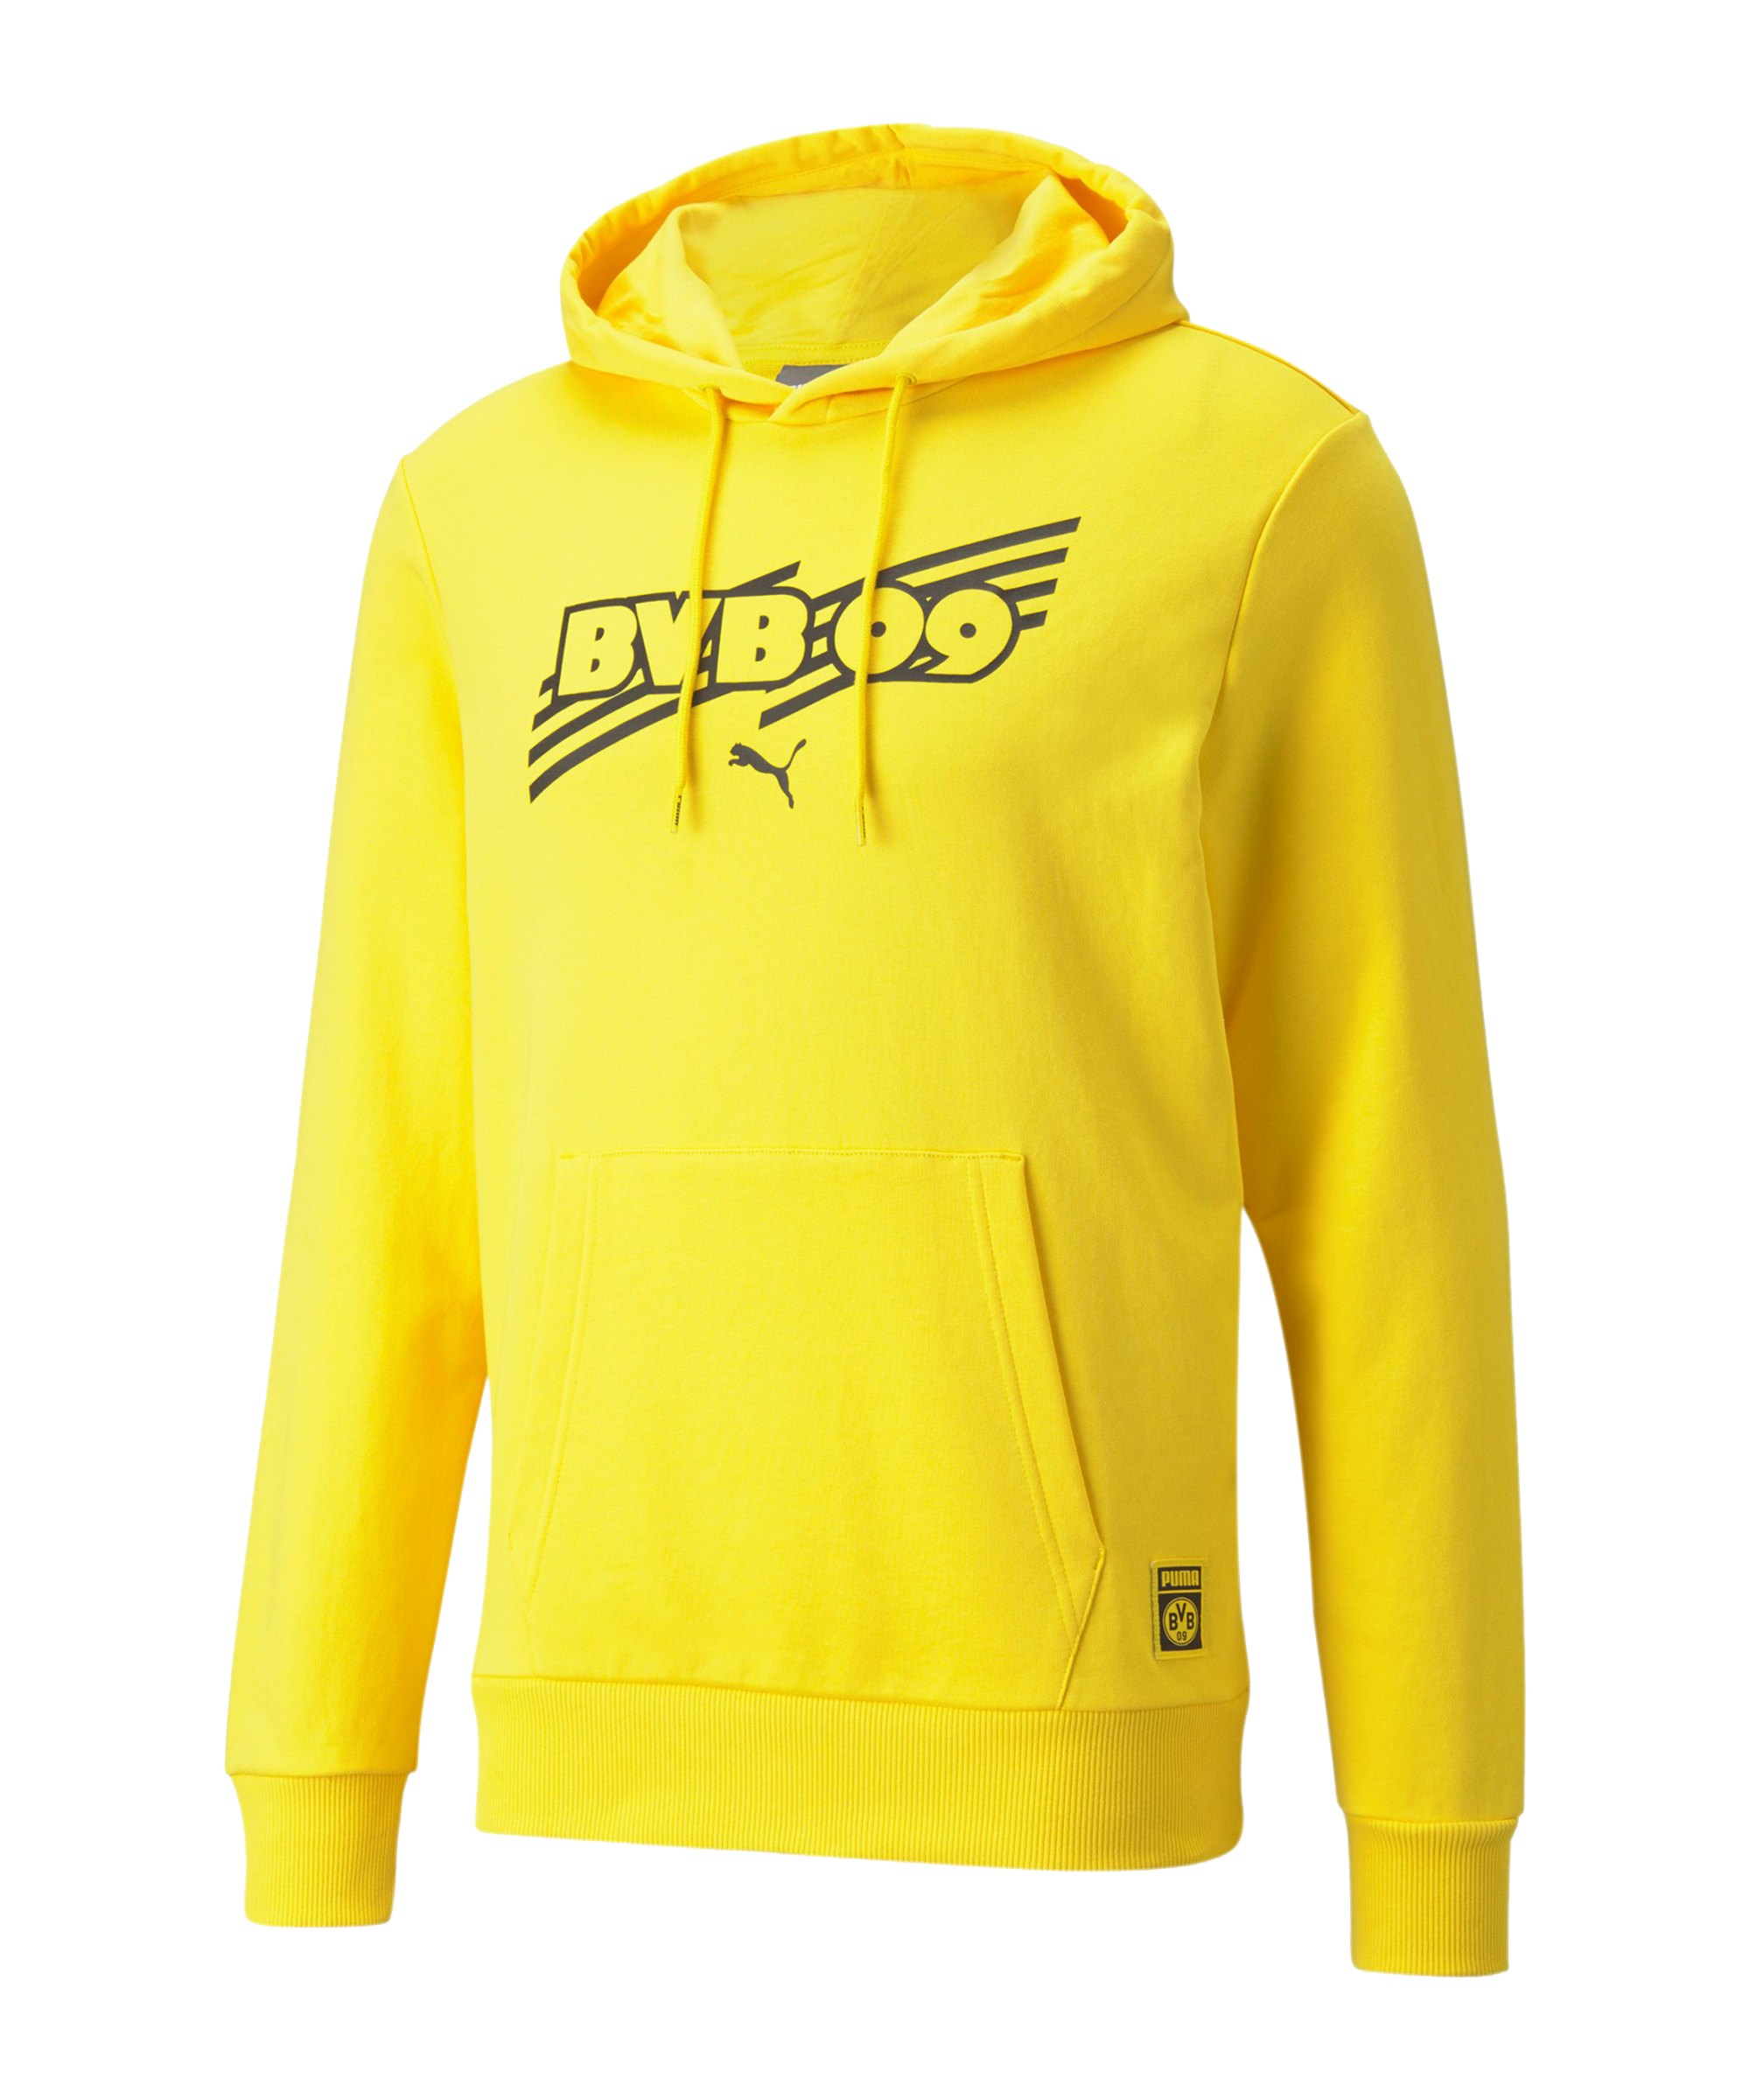 PUMA BVB Dortmund ftblCore Hoody Gelb F01 - gelb